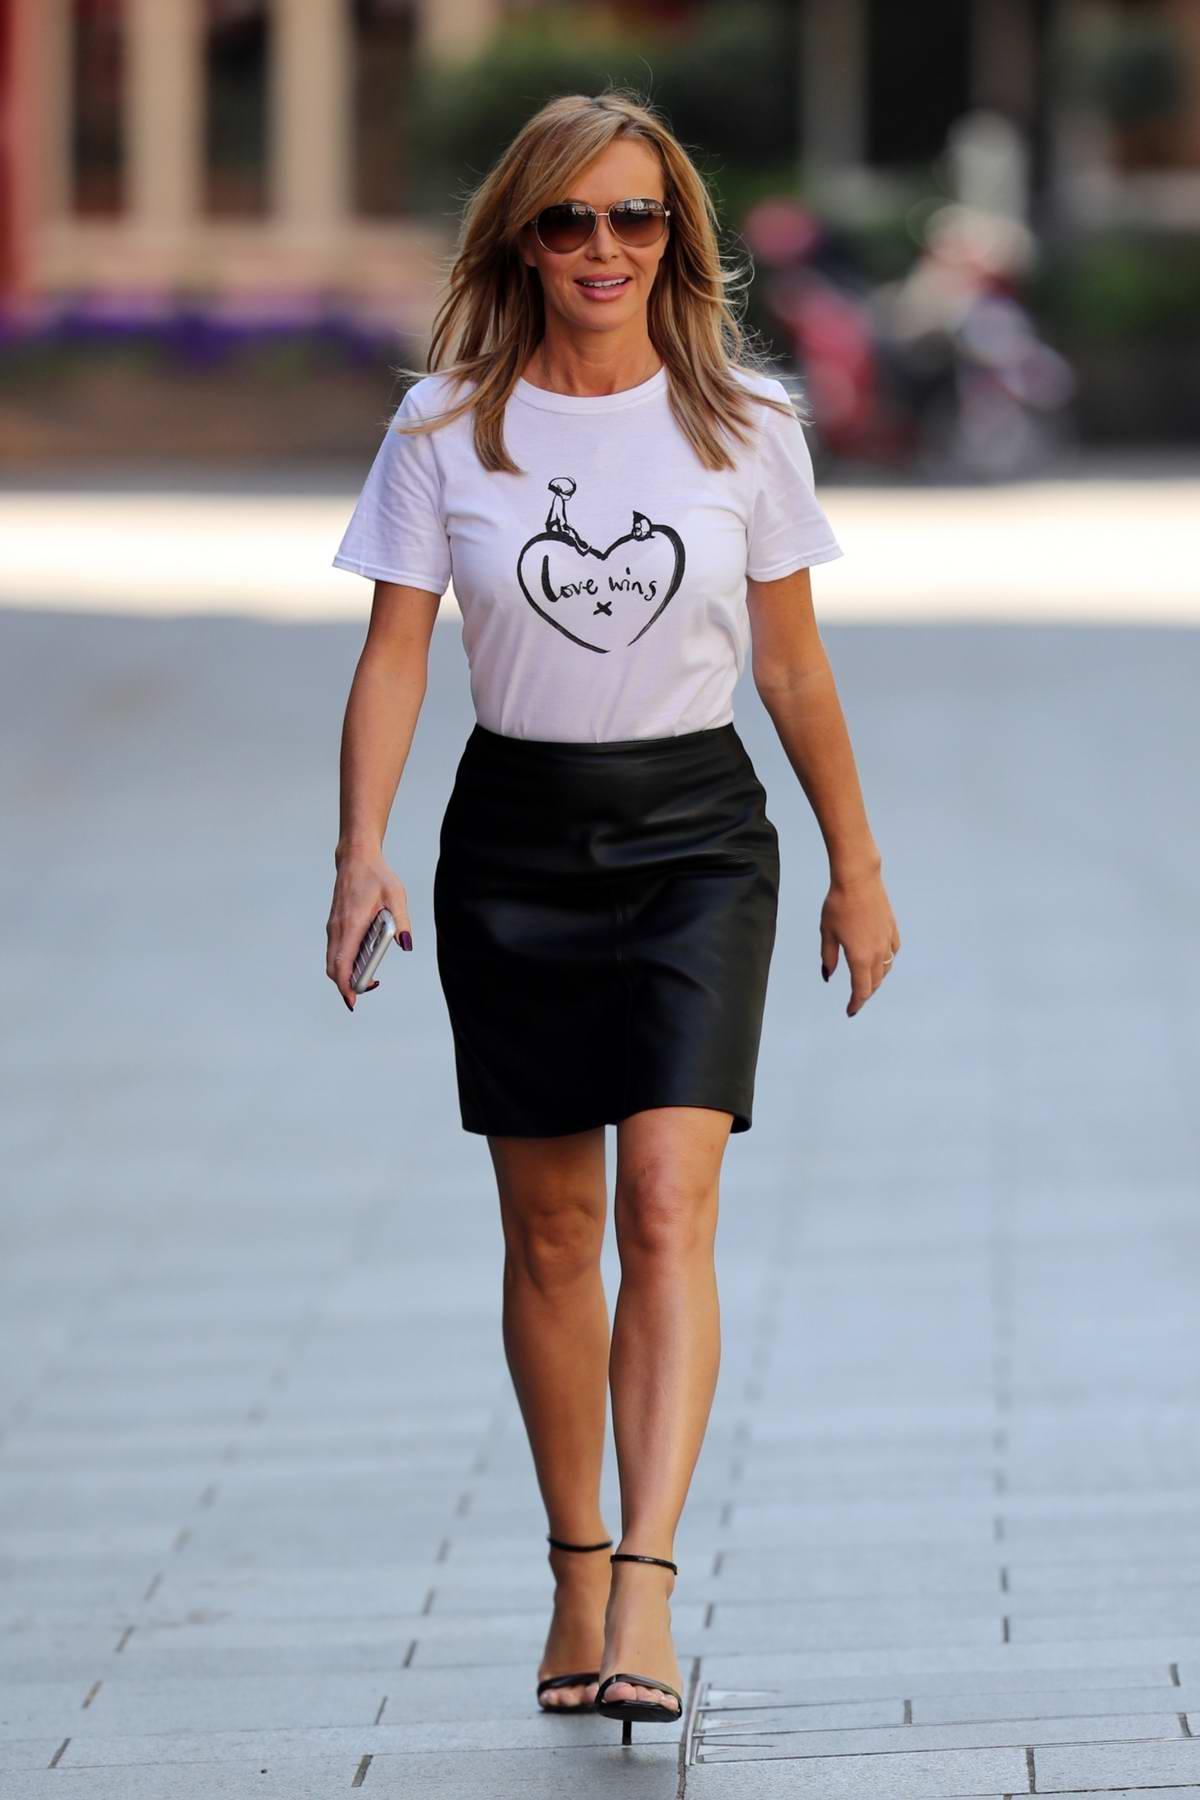 Amanda Holden wears Ted Baker top and black leather mini skirt as she leaves Heart Radio in London, UK